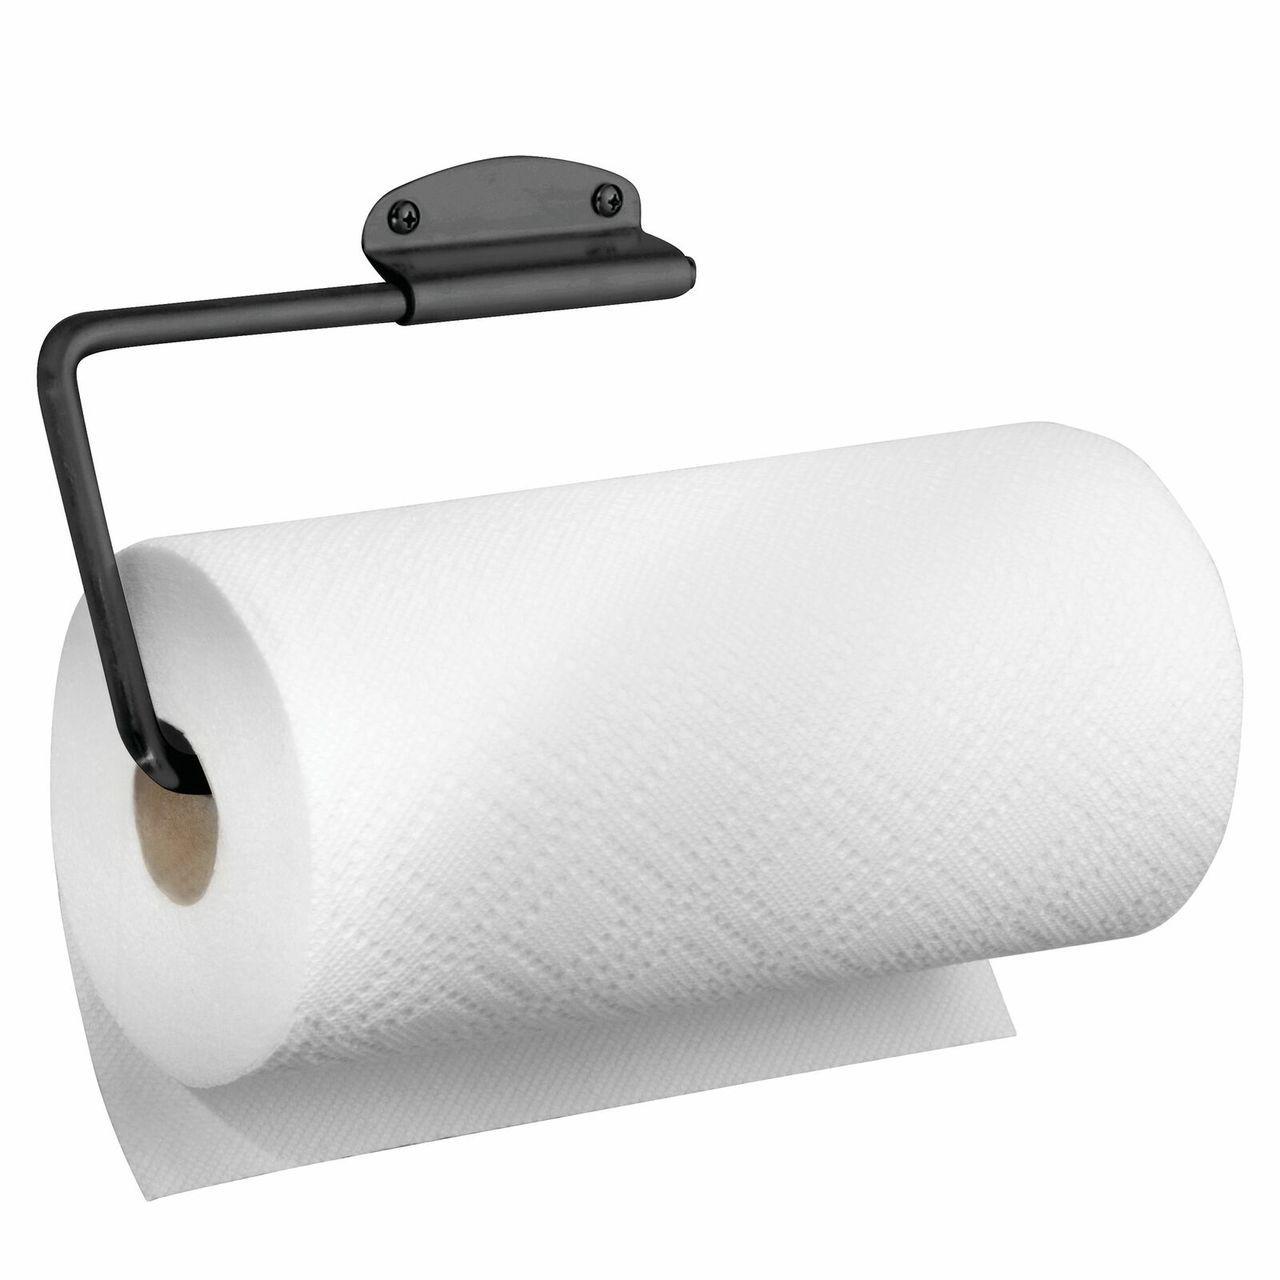 Metal Wall Mount Swivel Under Cabinet Paper Towel Holder Paper Towel Holder Towel Holder Metal Paper Towel Holder